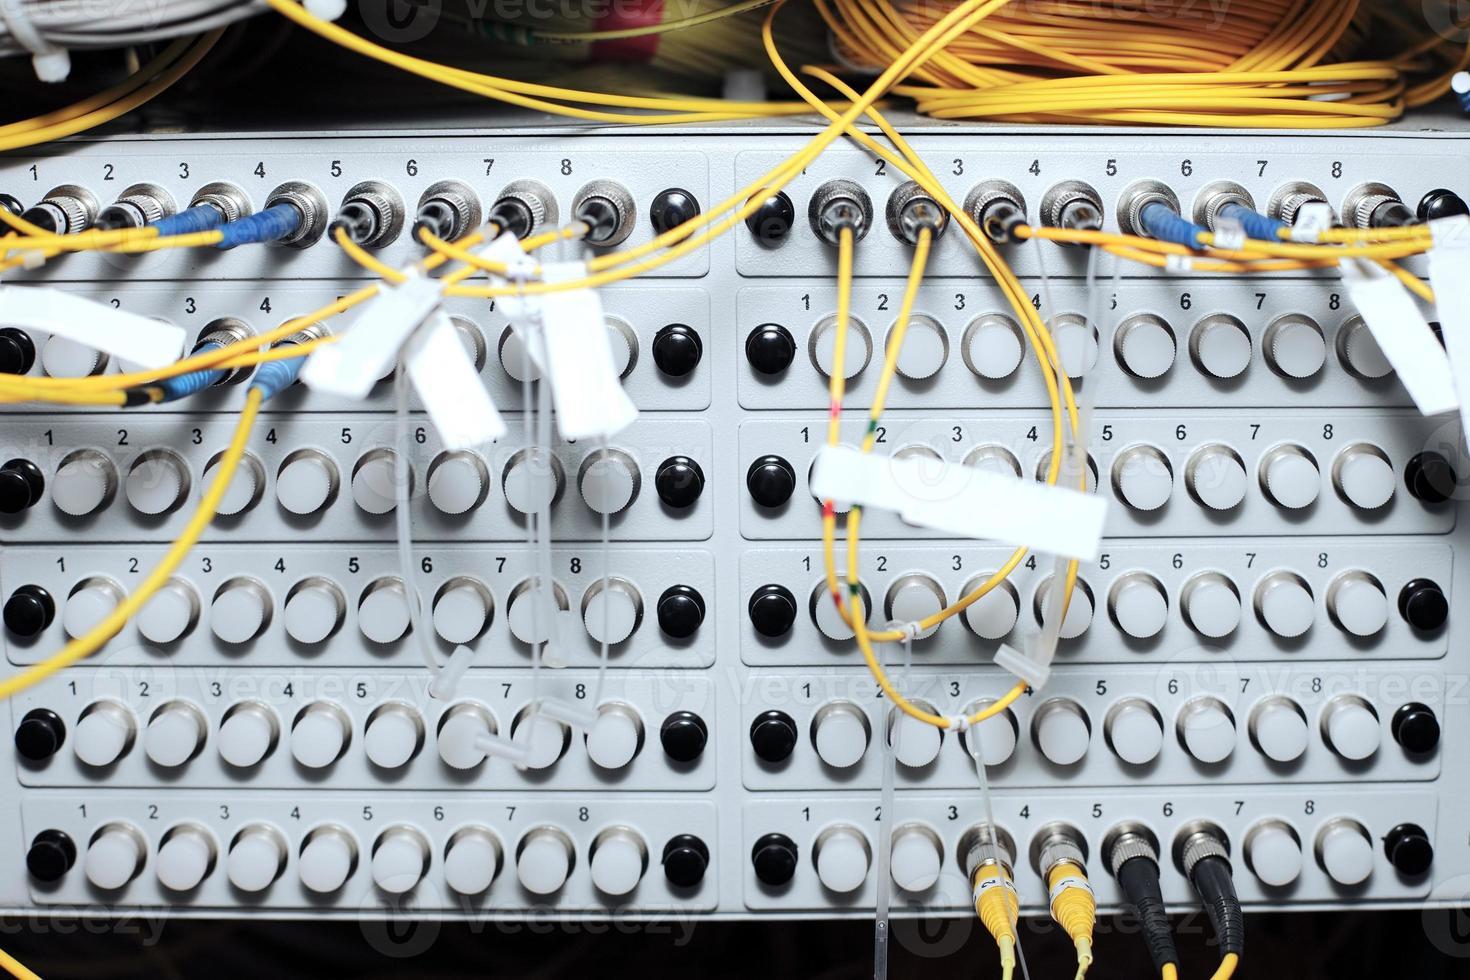 equipo de telecomunicaciones, multiplexor óptico. foto